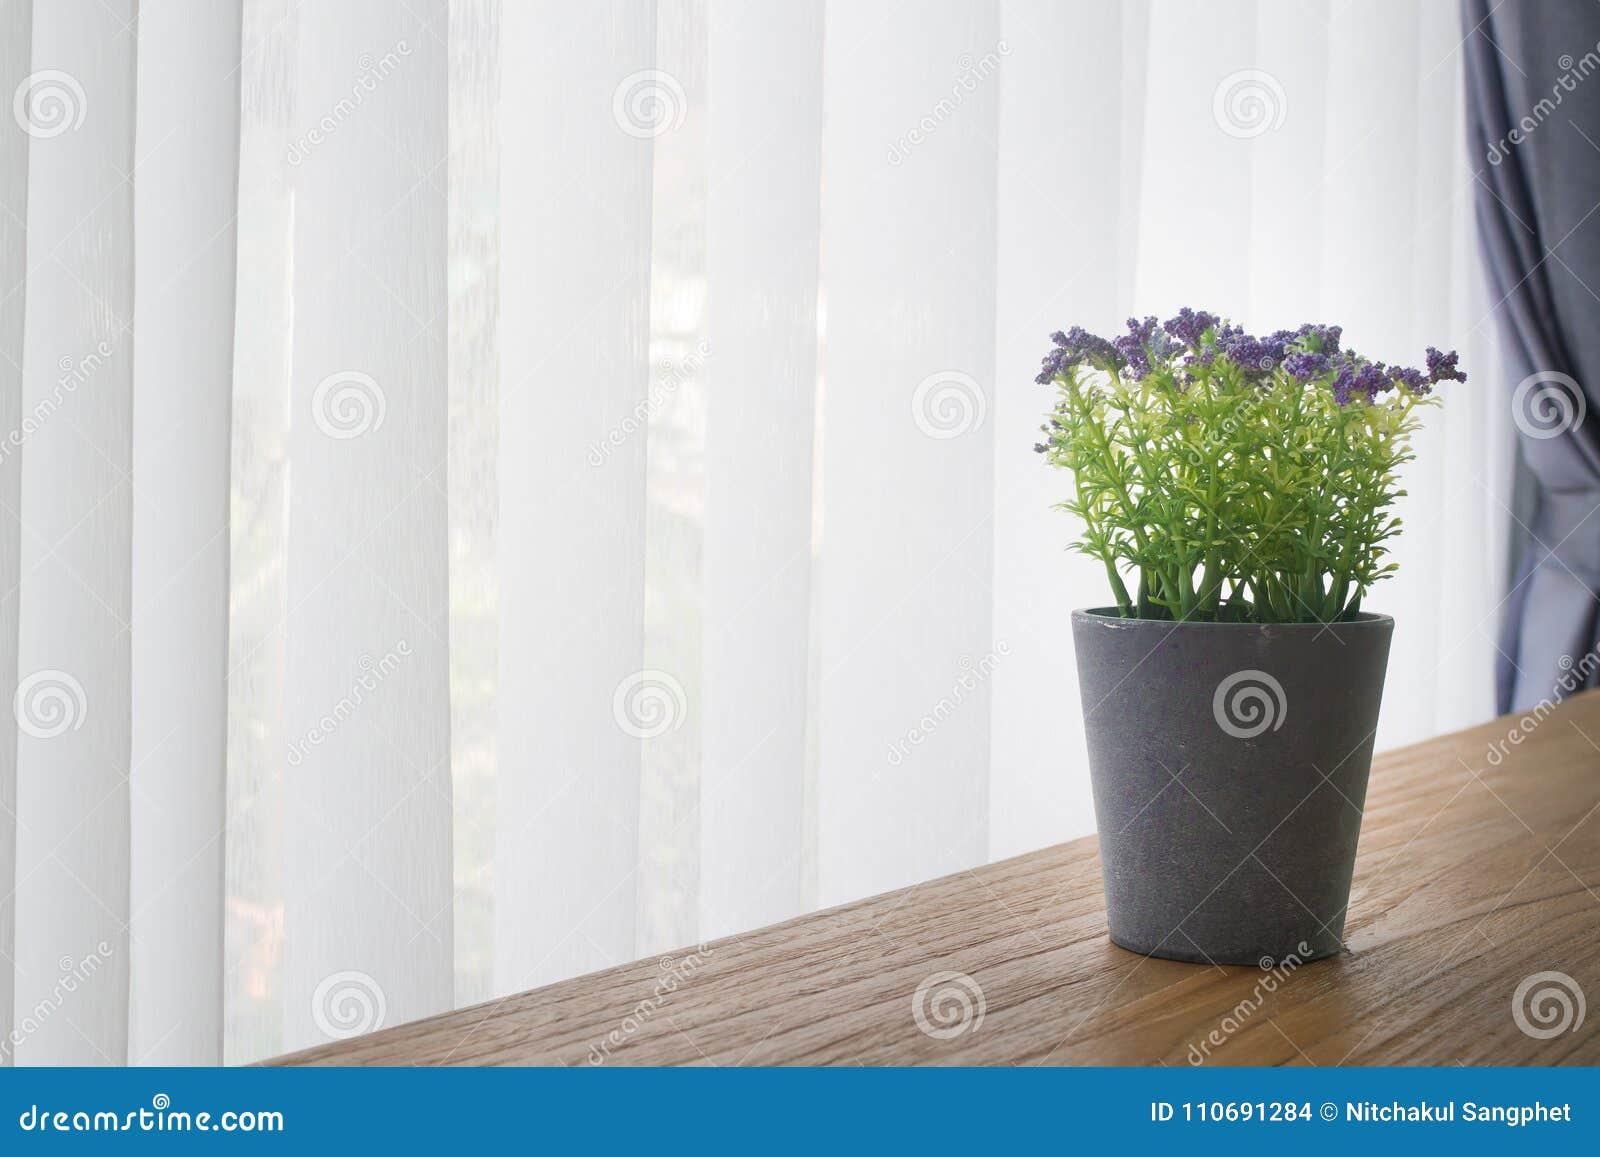 office flower pots. Office Flower Pots. Royalty-free Stock Photo Pots O